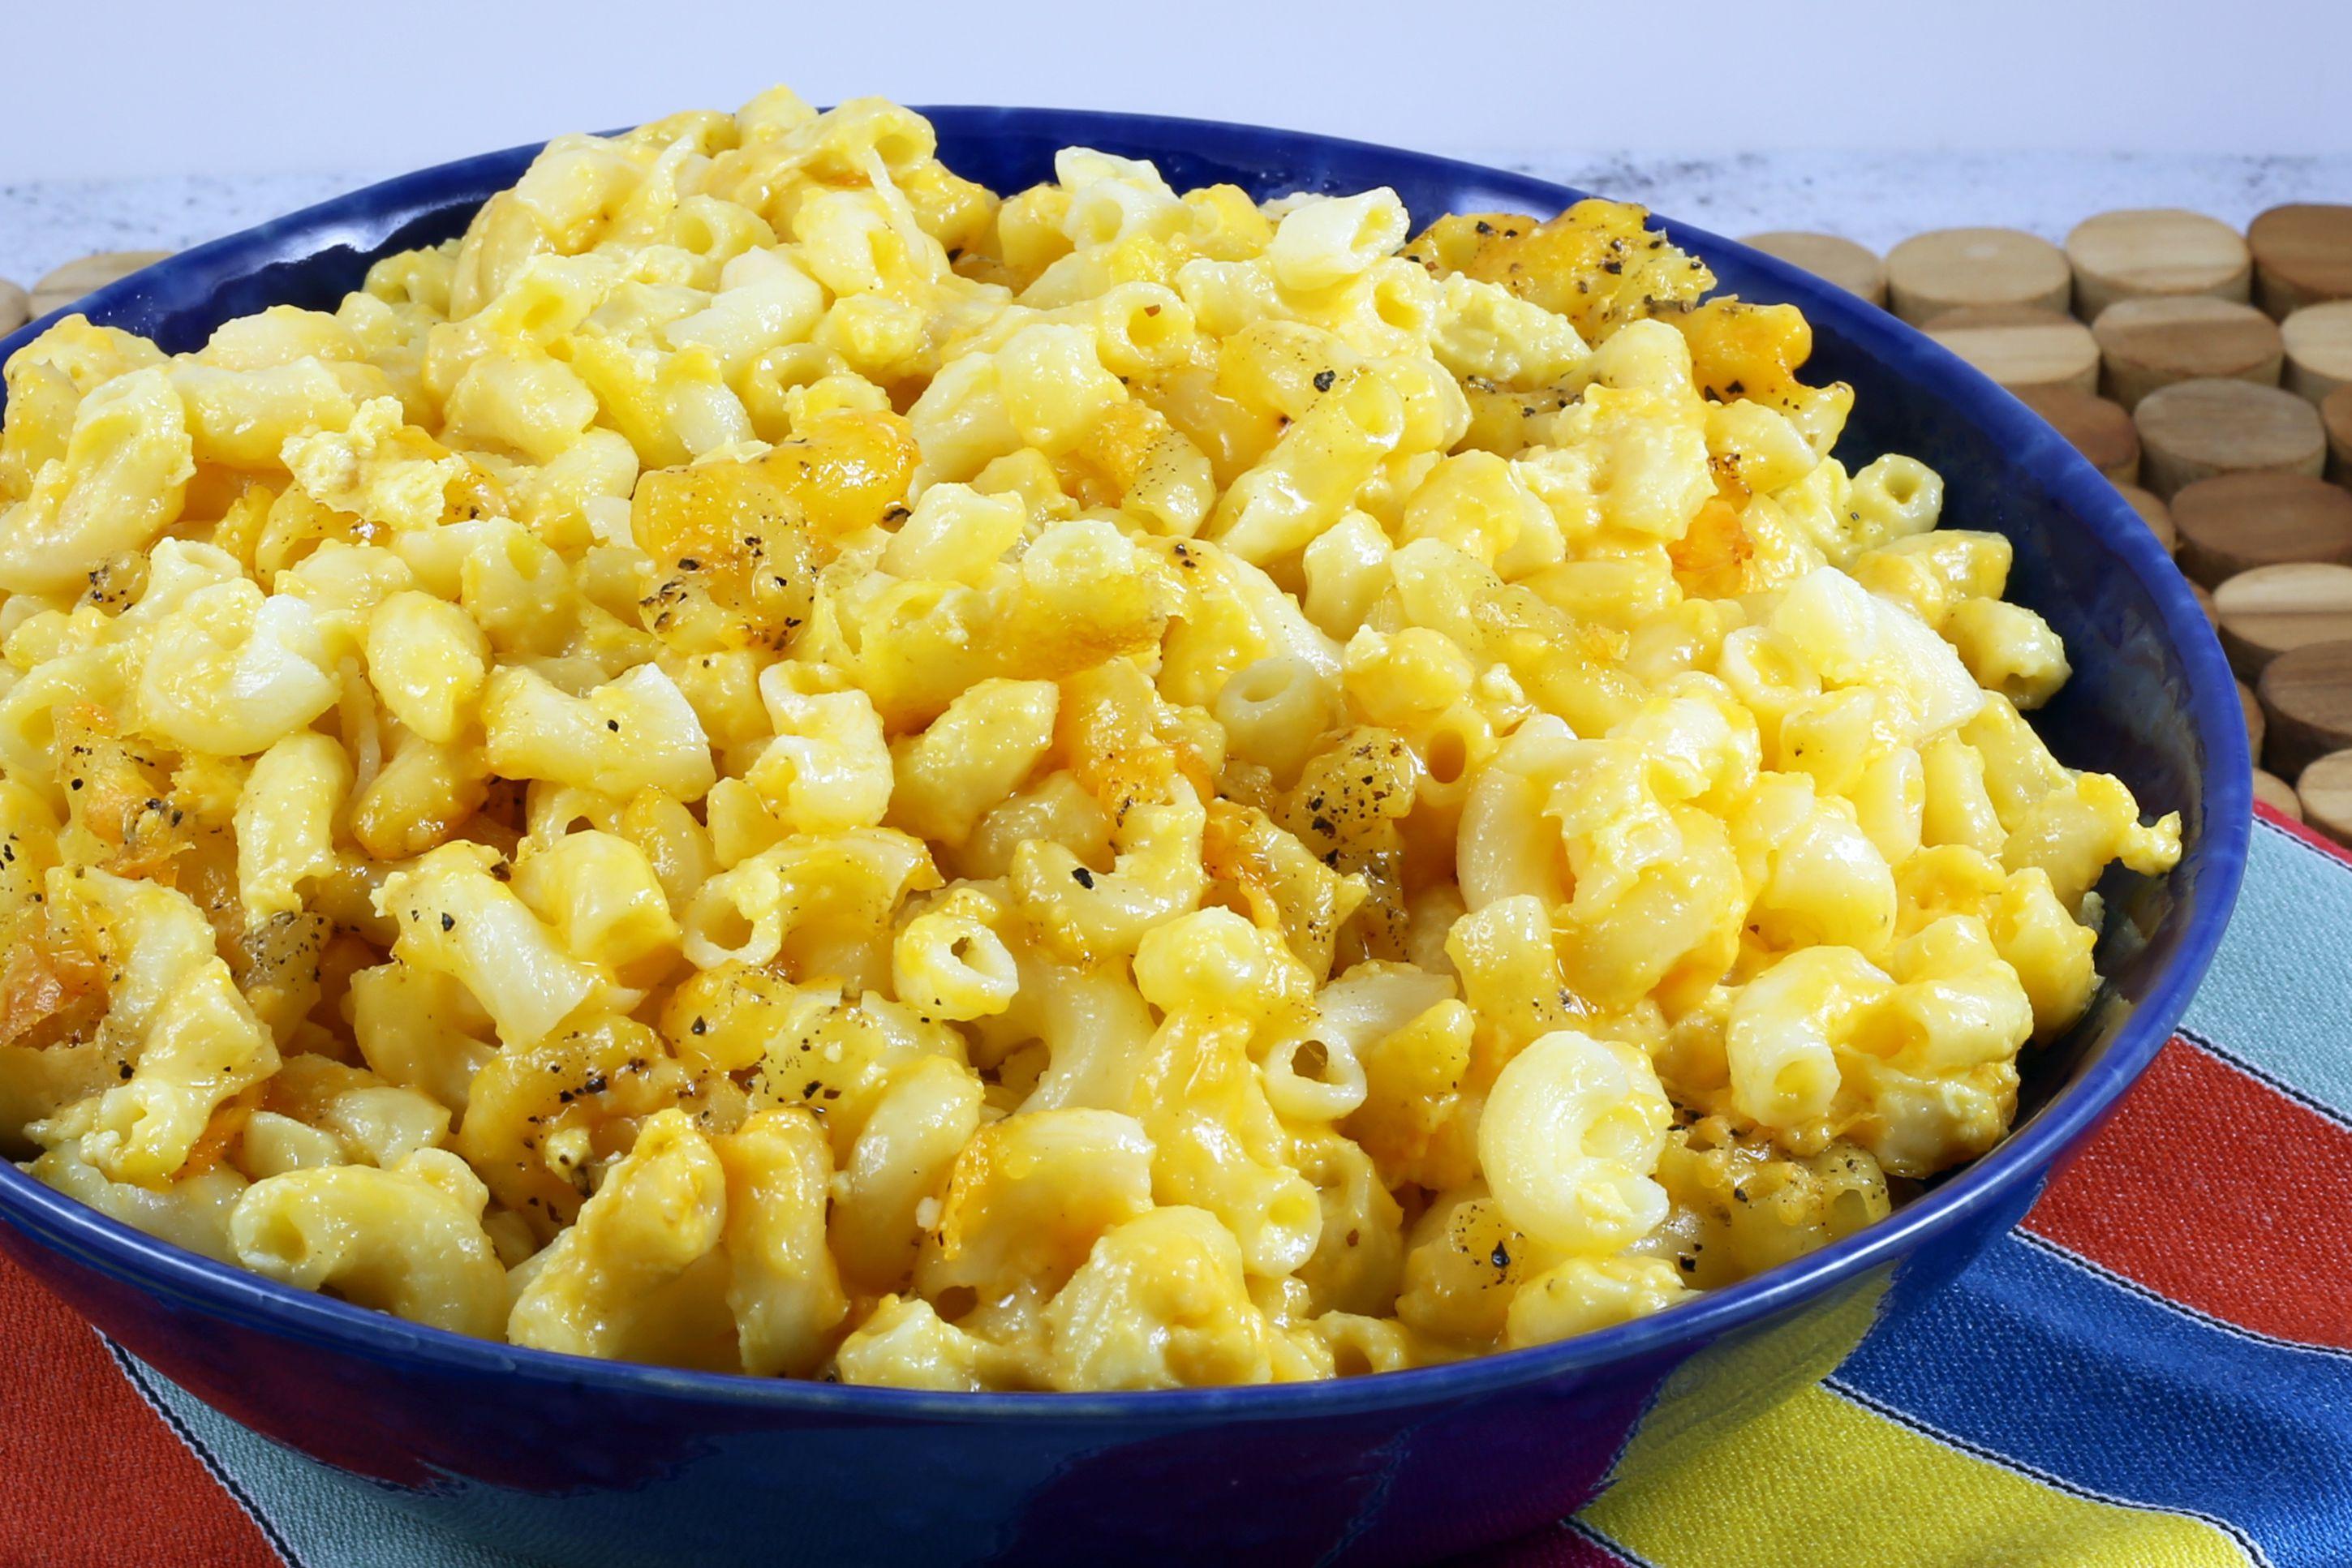 Macaroni And Cheese Casserole Recipe No Sauce